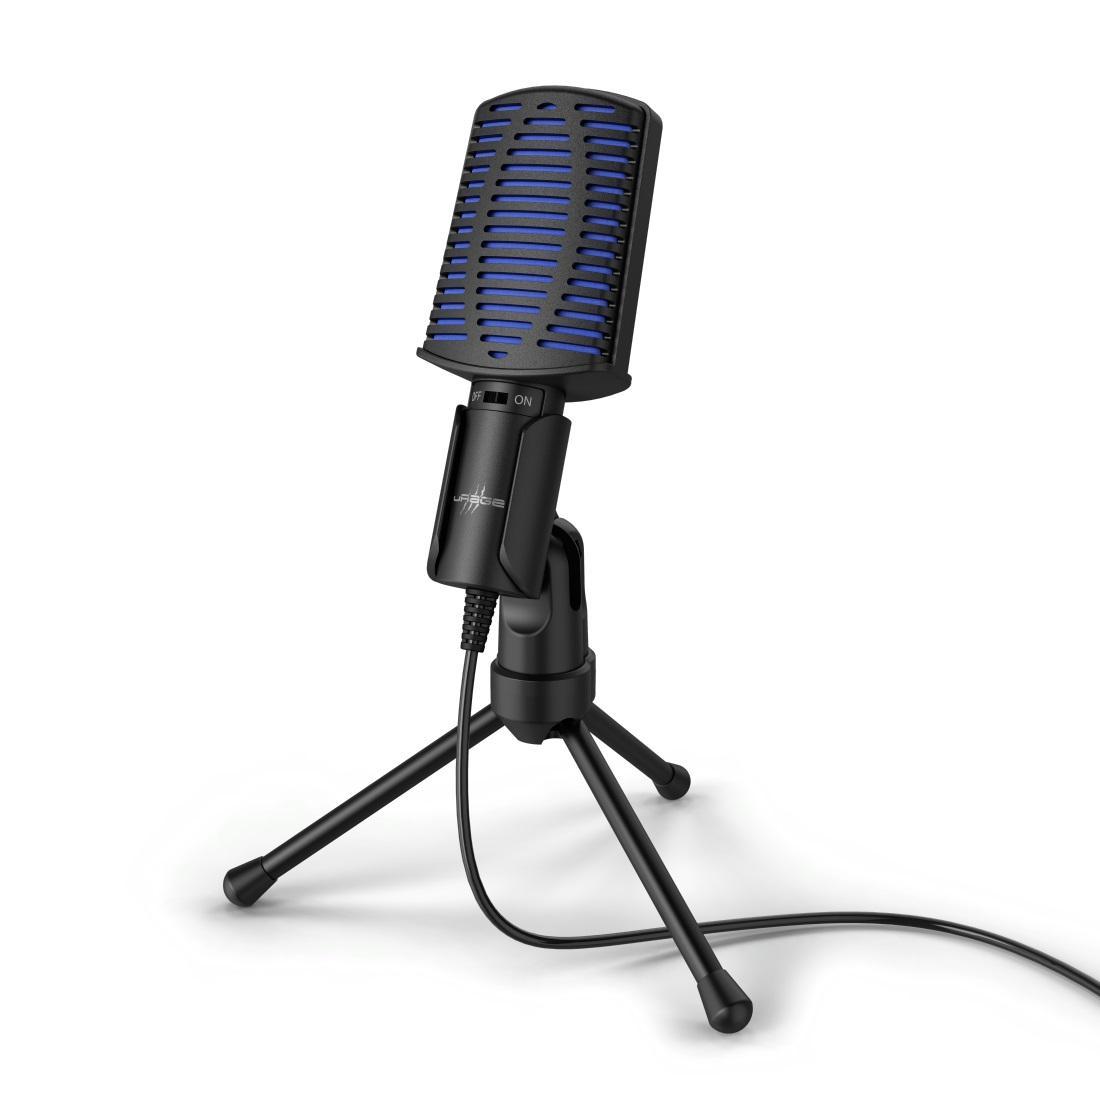 Настолен микрофон uRage Stream 100, USB, Черен